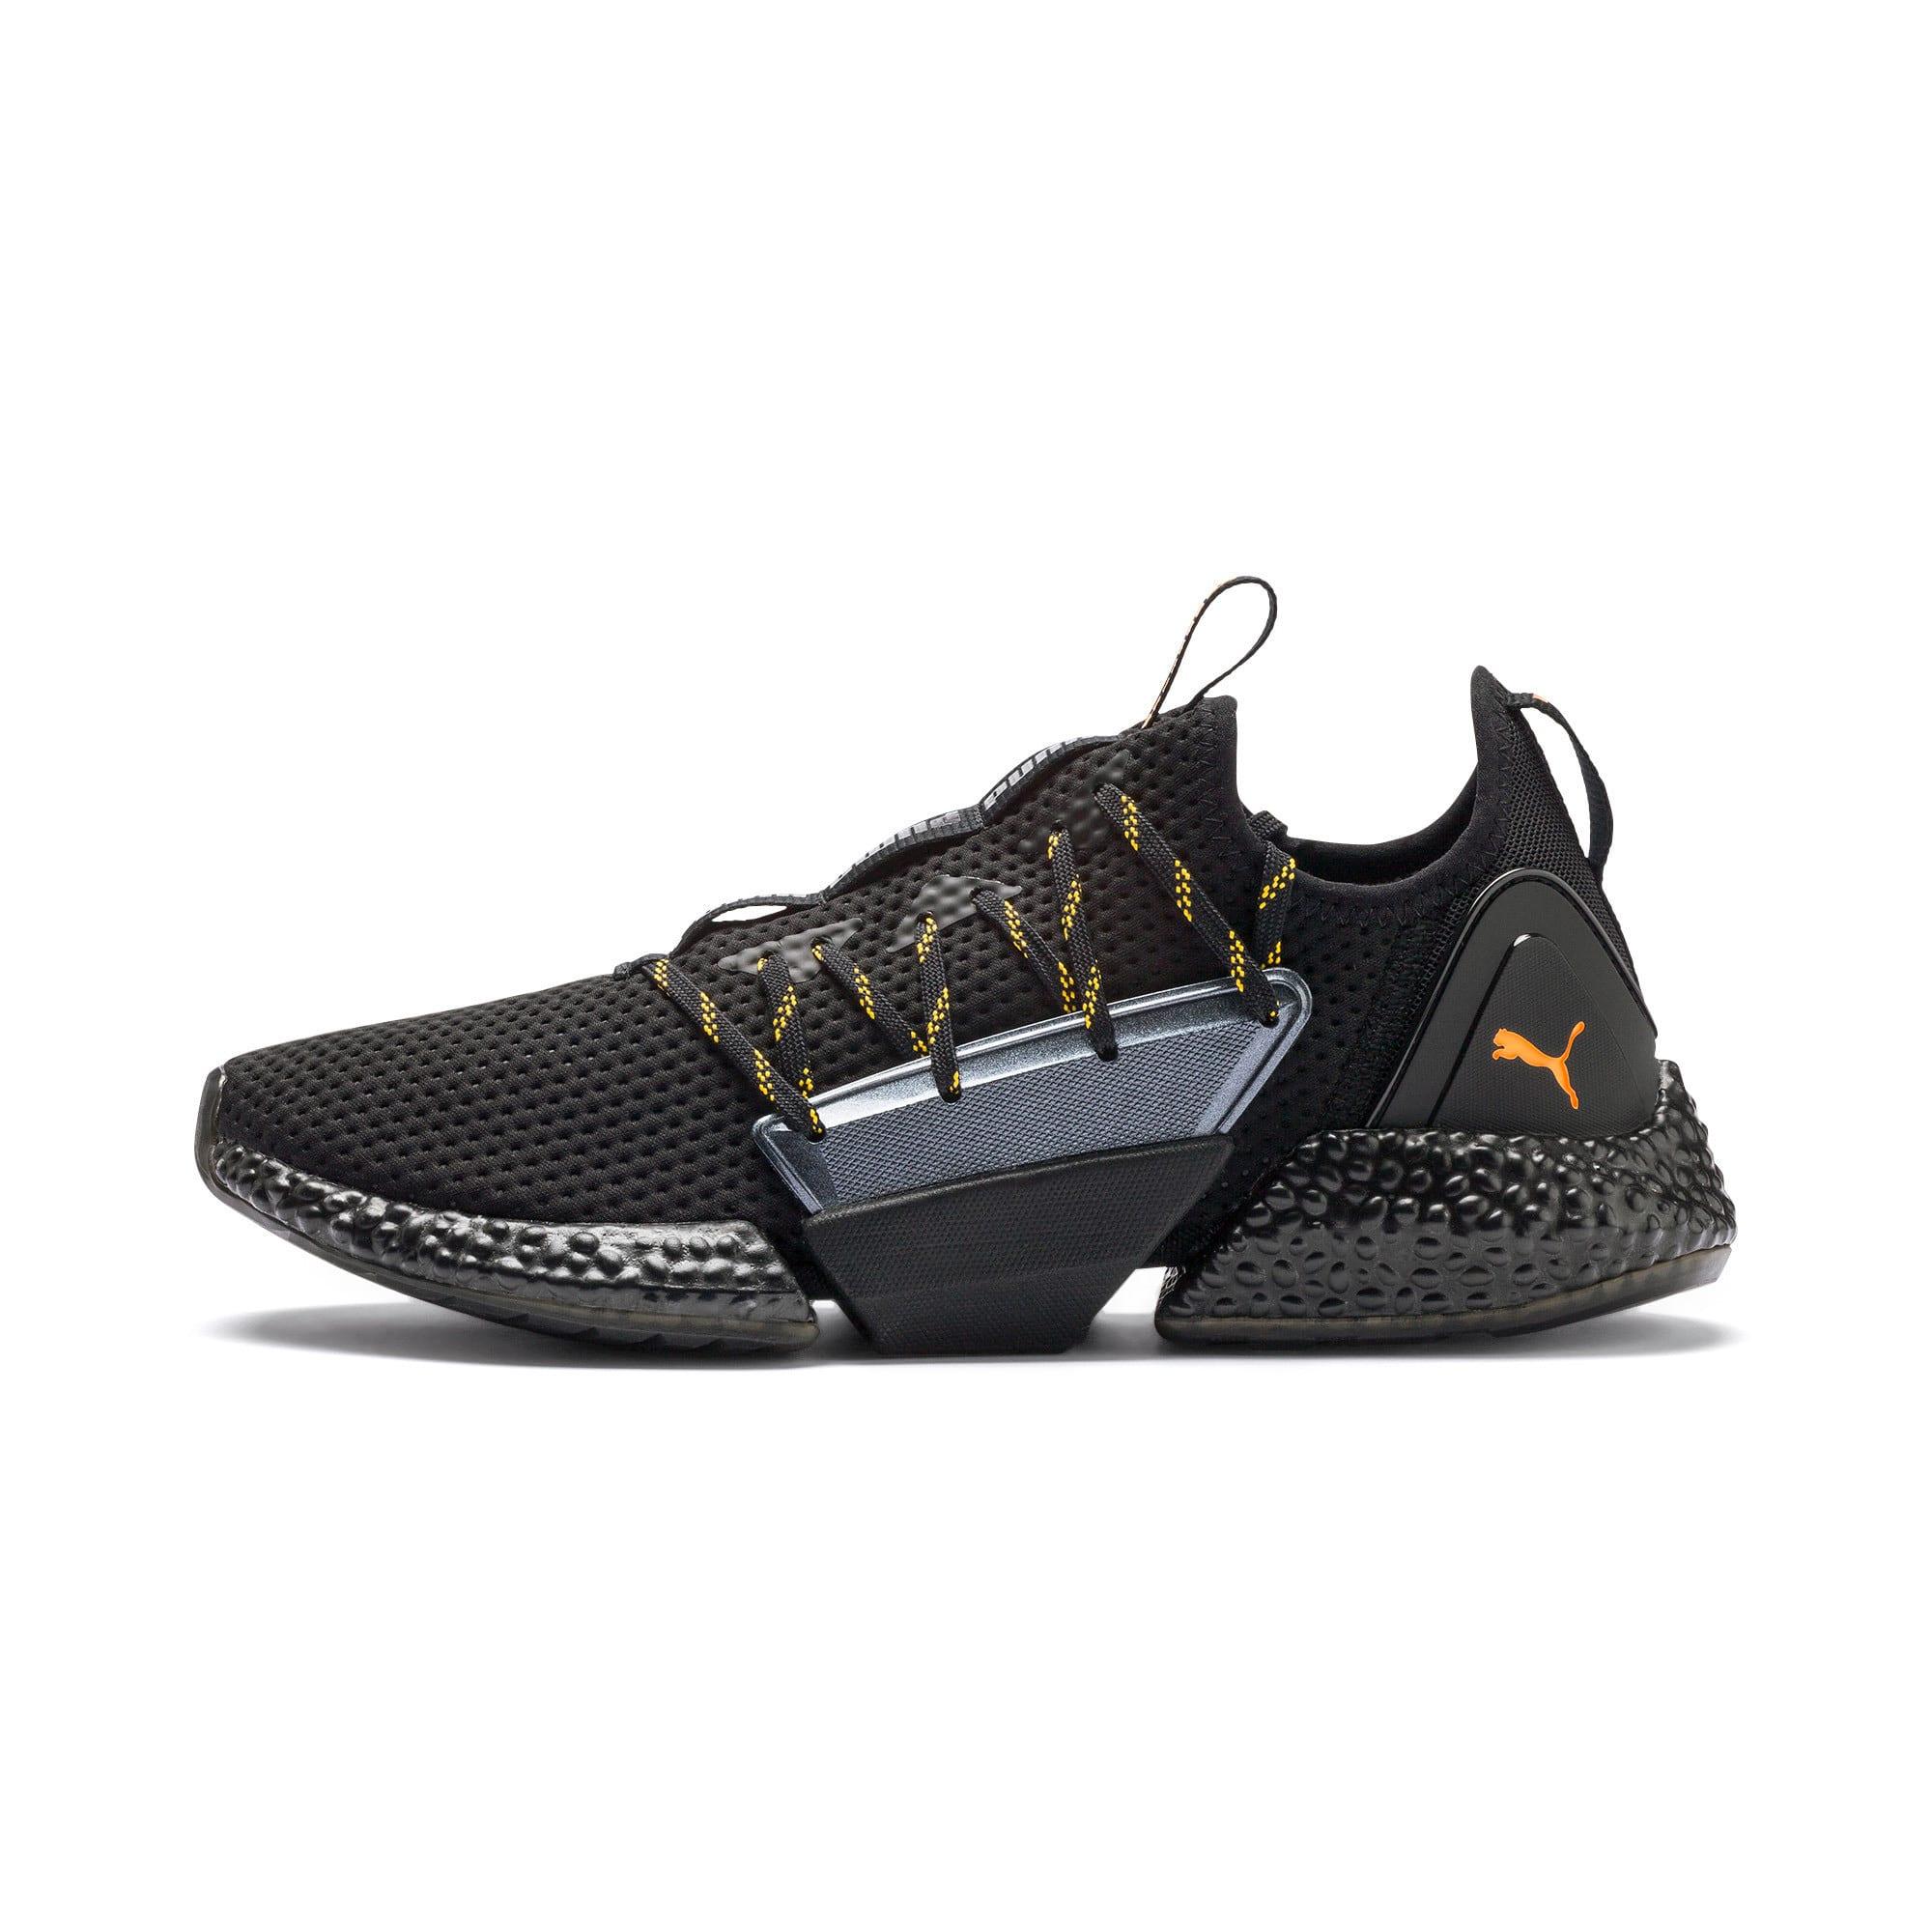 Thumbnail 1 of HYBRID Rocket Aero Men's Sneakers, Puma Black-Puma Black, medium